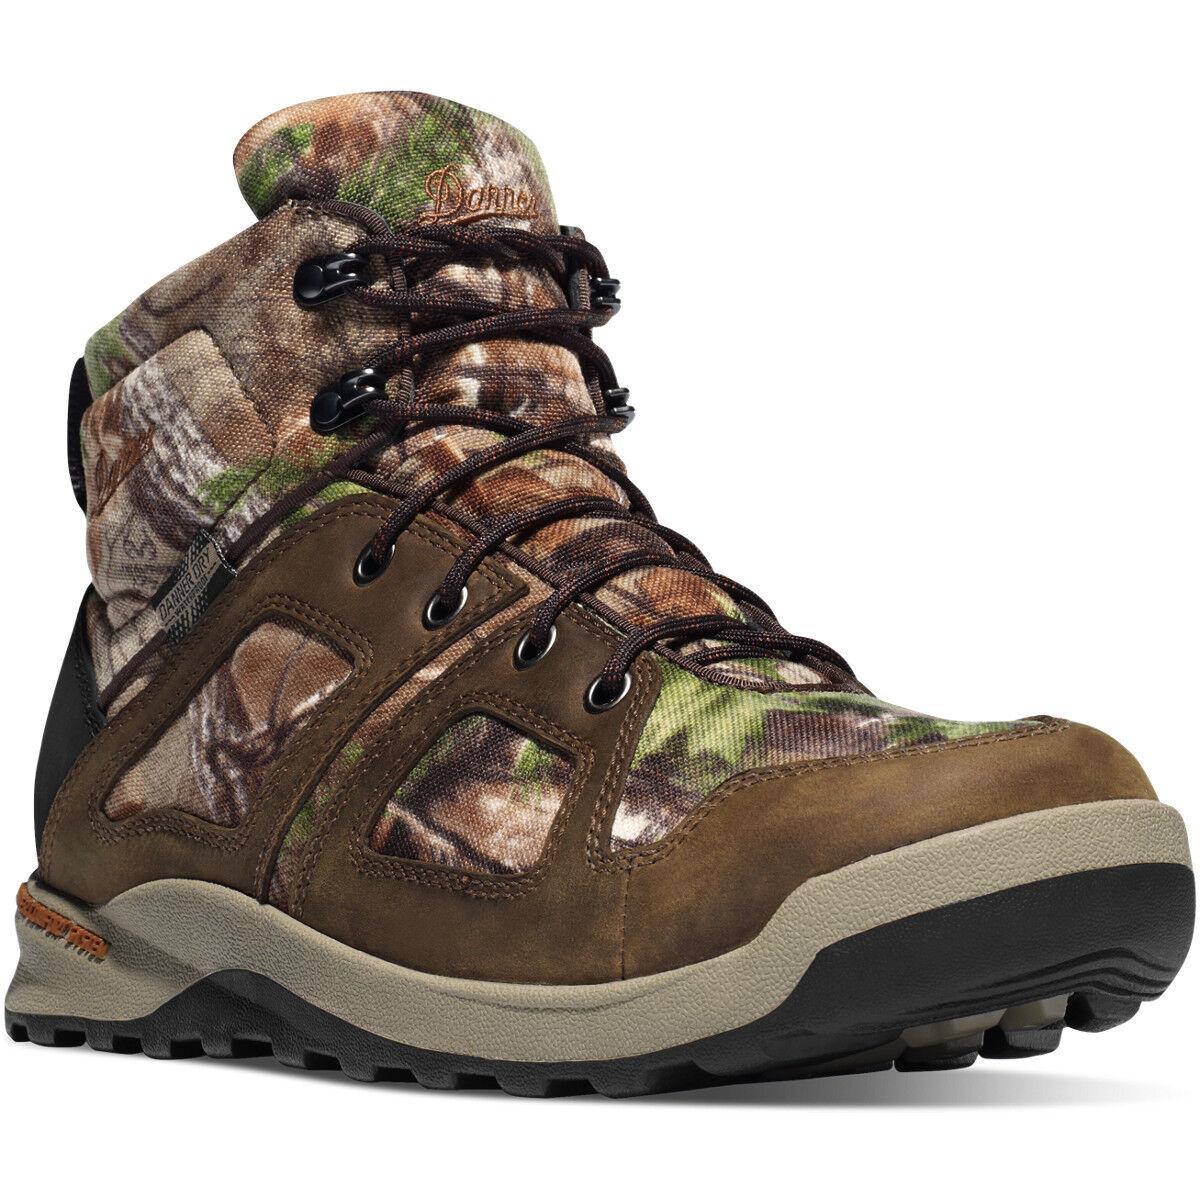 Nuevas botas de caza Danner firme, 6 , Realtree Xtra Danner Dry impermeable